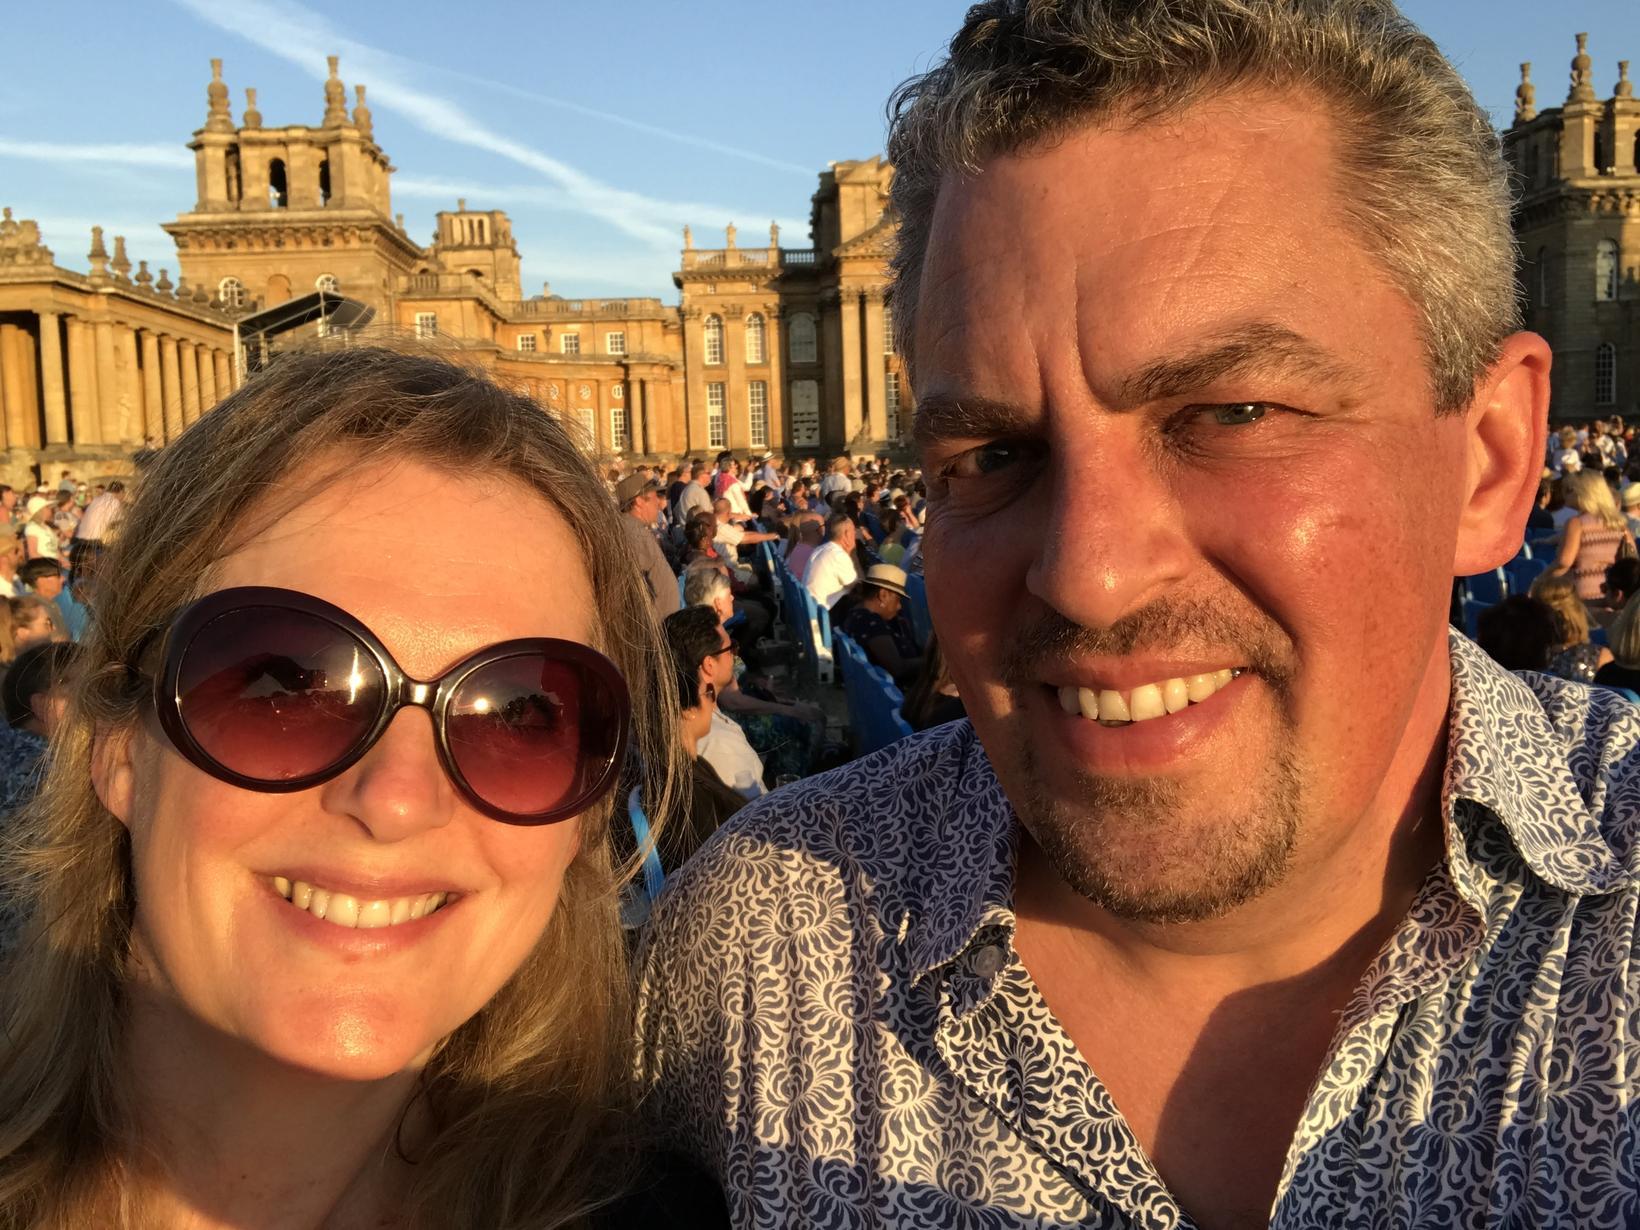 Isobel & Jason from Oxford, United Kingdom